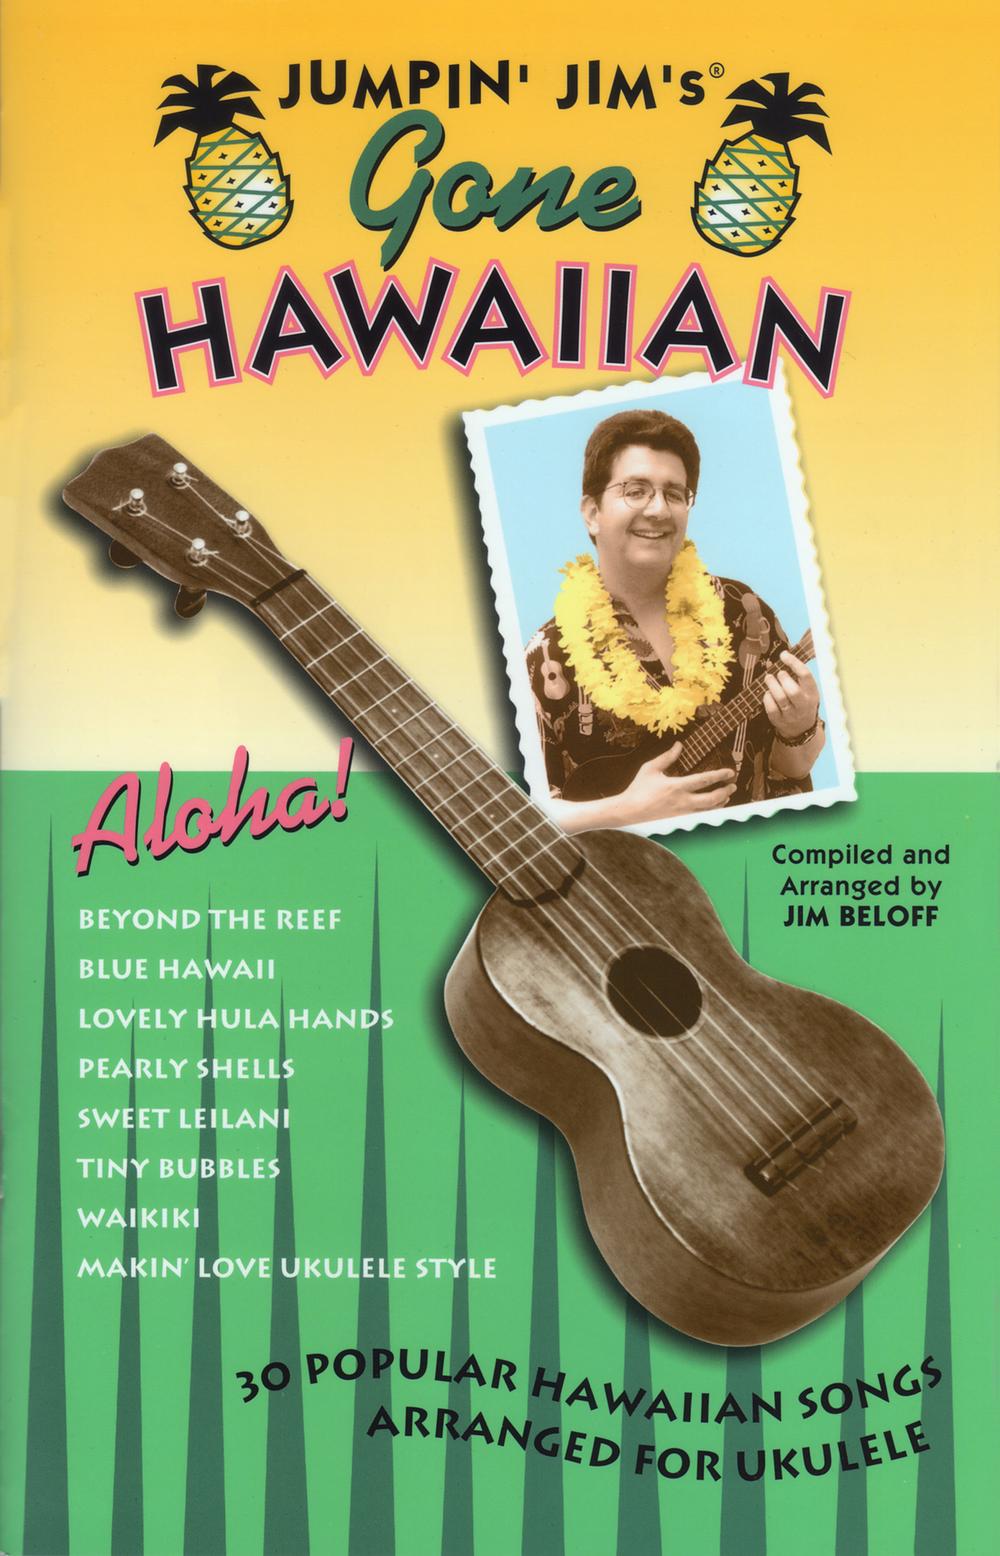 Jumpin' Jim's Gone Hawaiian